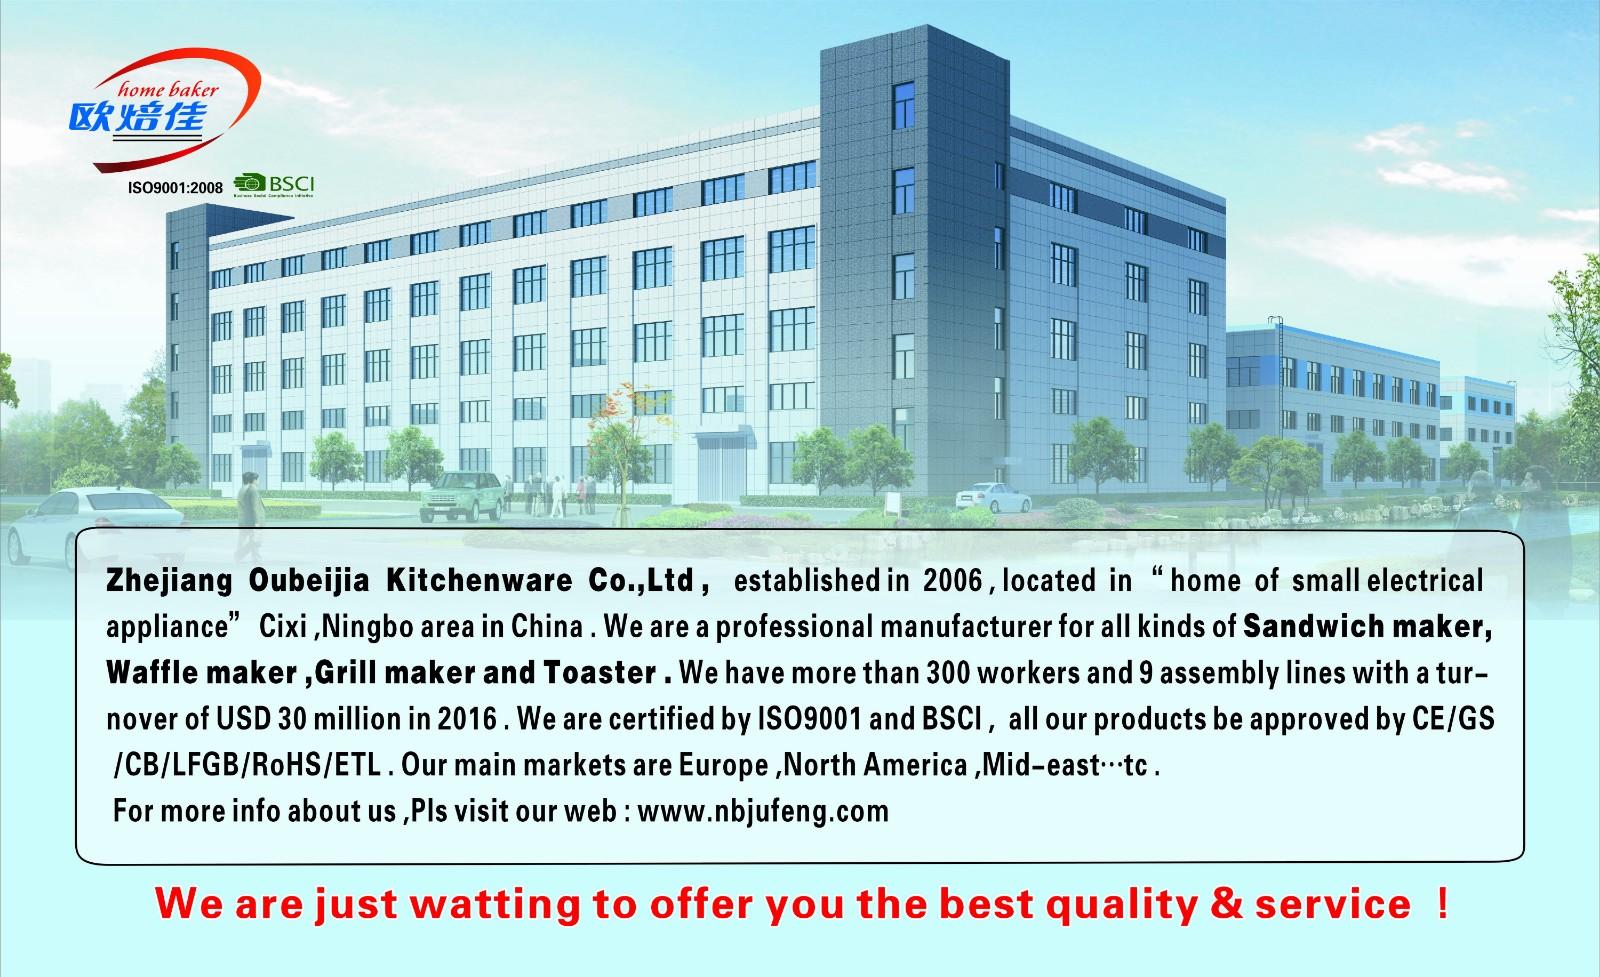 Zhejiang Oubeijia Kitchenware Co.,Ltd.